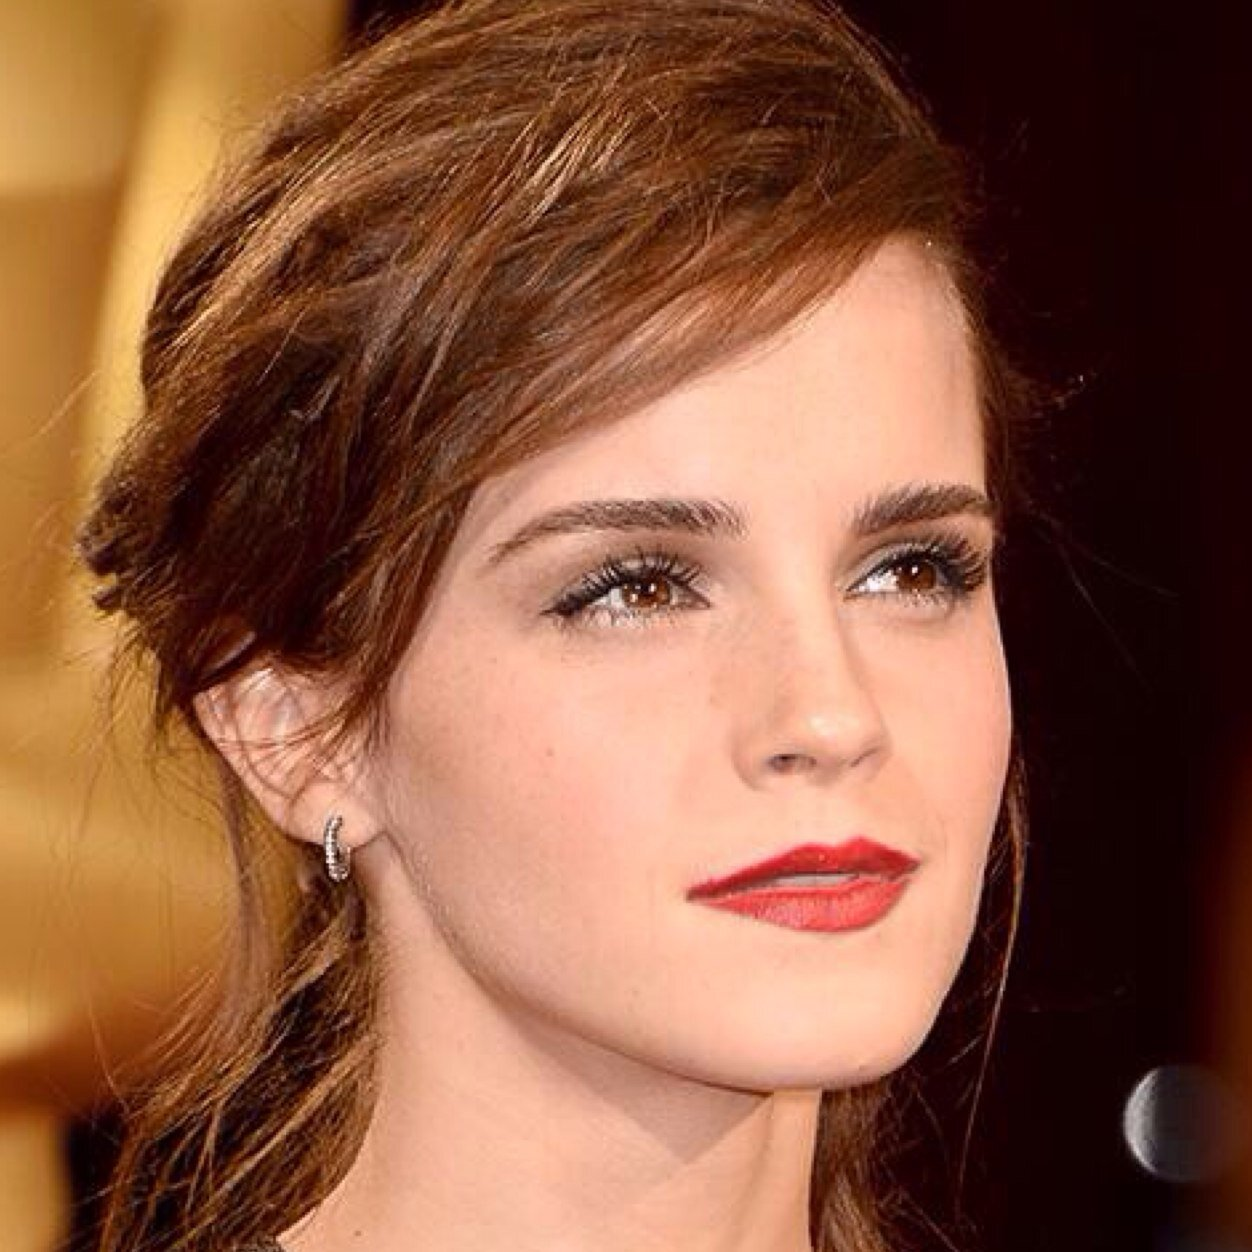 Emma Watson图片_喝小酒的网摘: http://blog.hehehehehe.cn/img/30206/